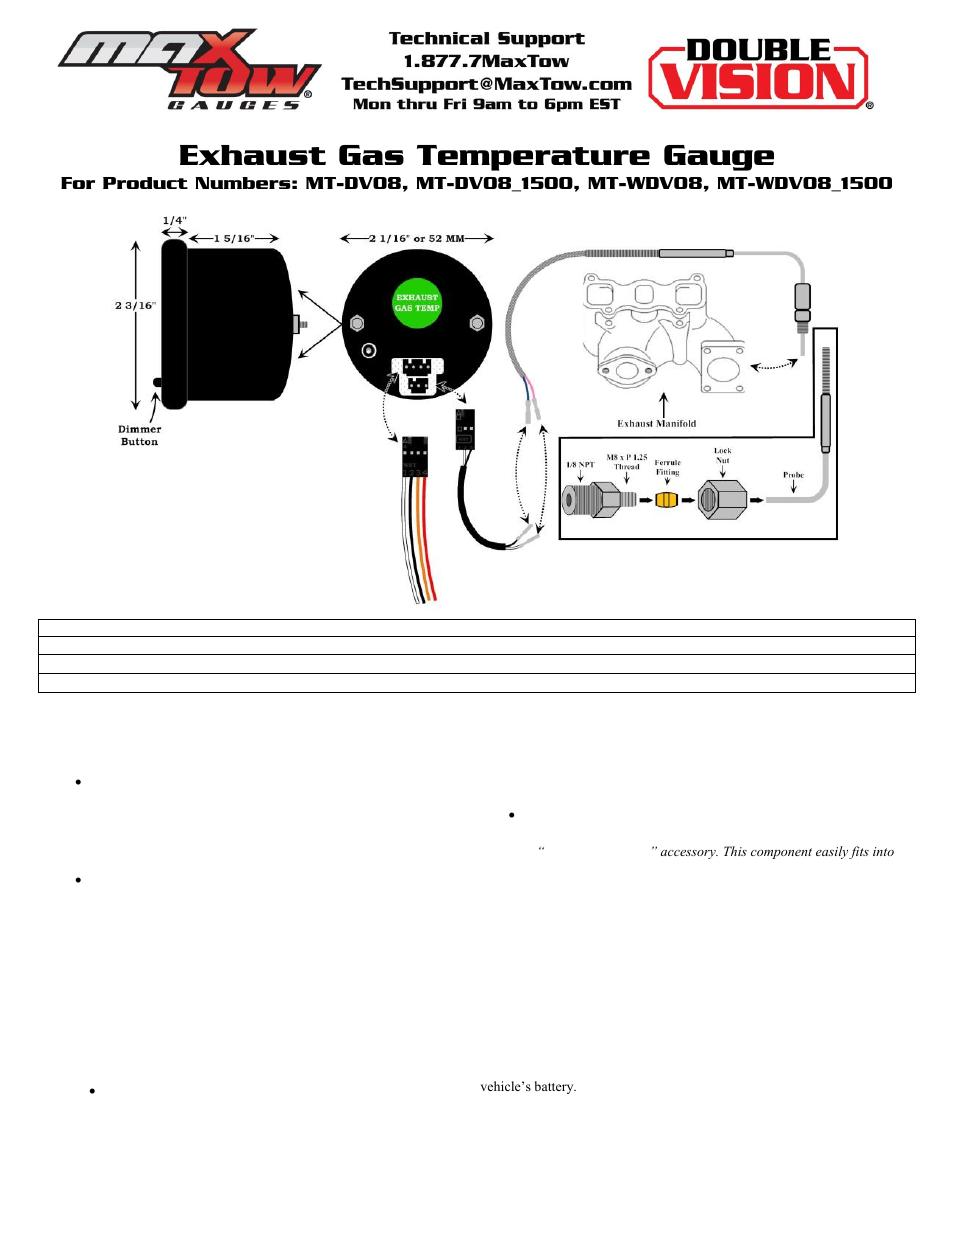 glowshift maxtow series exhaust gas temperature gauge user Glowshift Wiring Diagram gauge pod install 5 9 cummins 24 valve